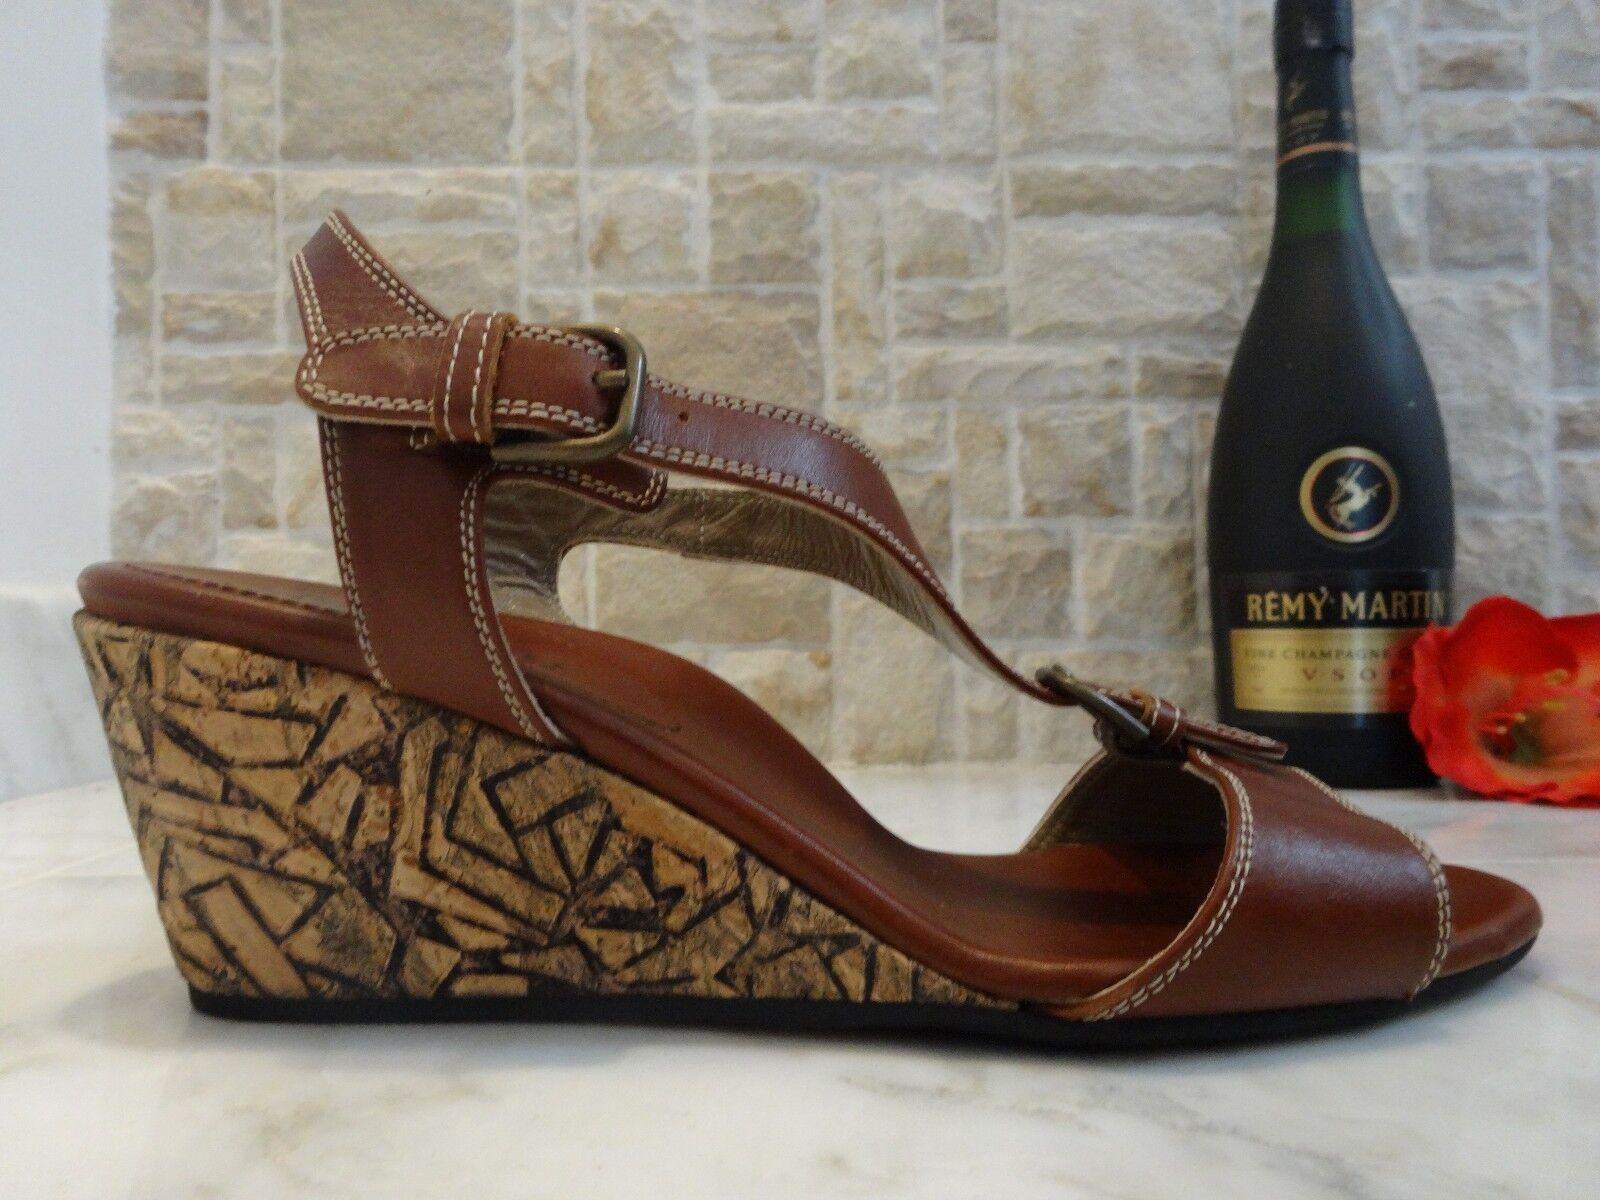 Anyi Lu 'Lola' marron Leather Wedge Sandals US-8.5M EUR-38.5M MSRP MSRP MSRP  395 bd2bbd